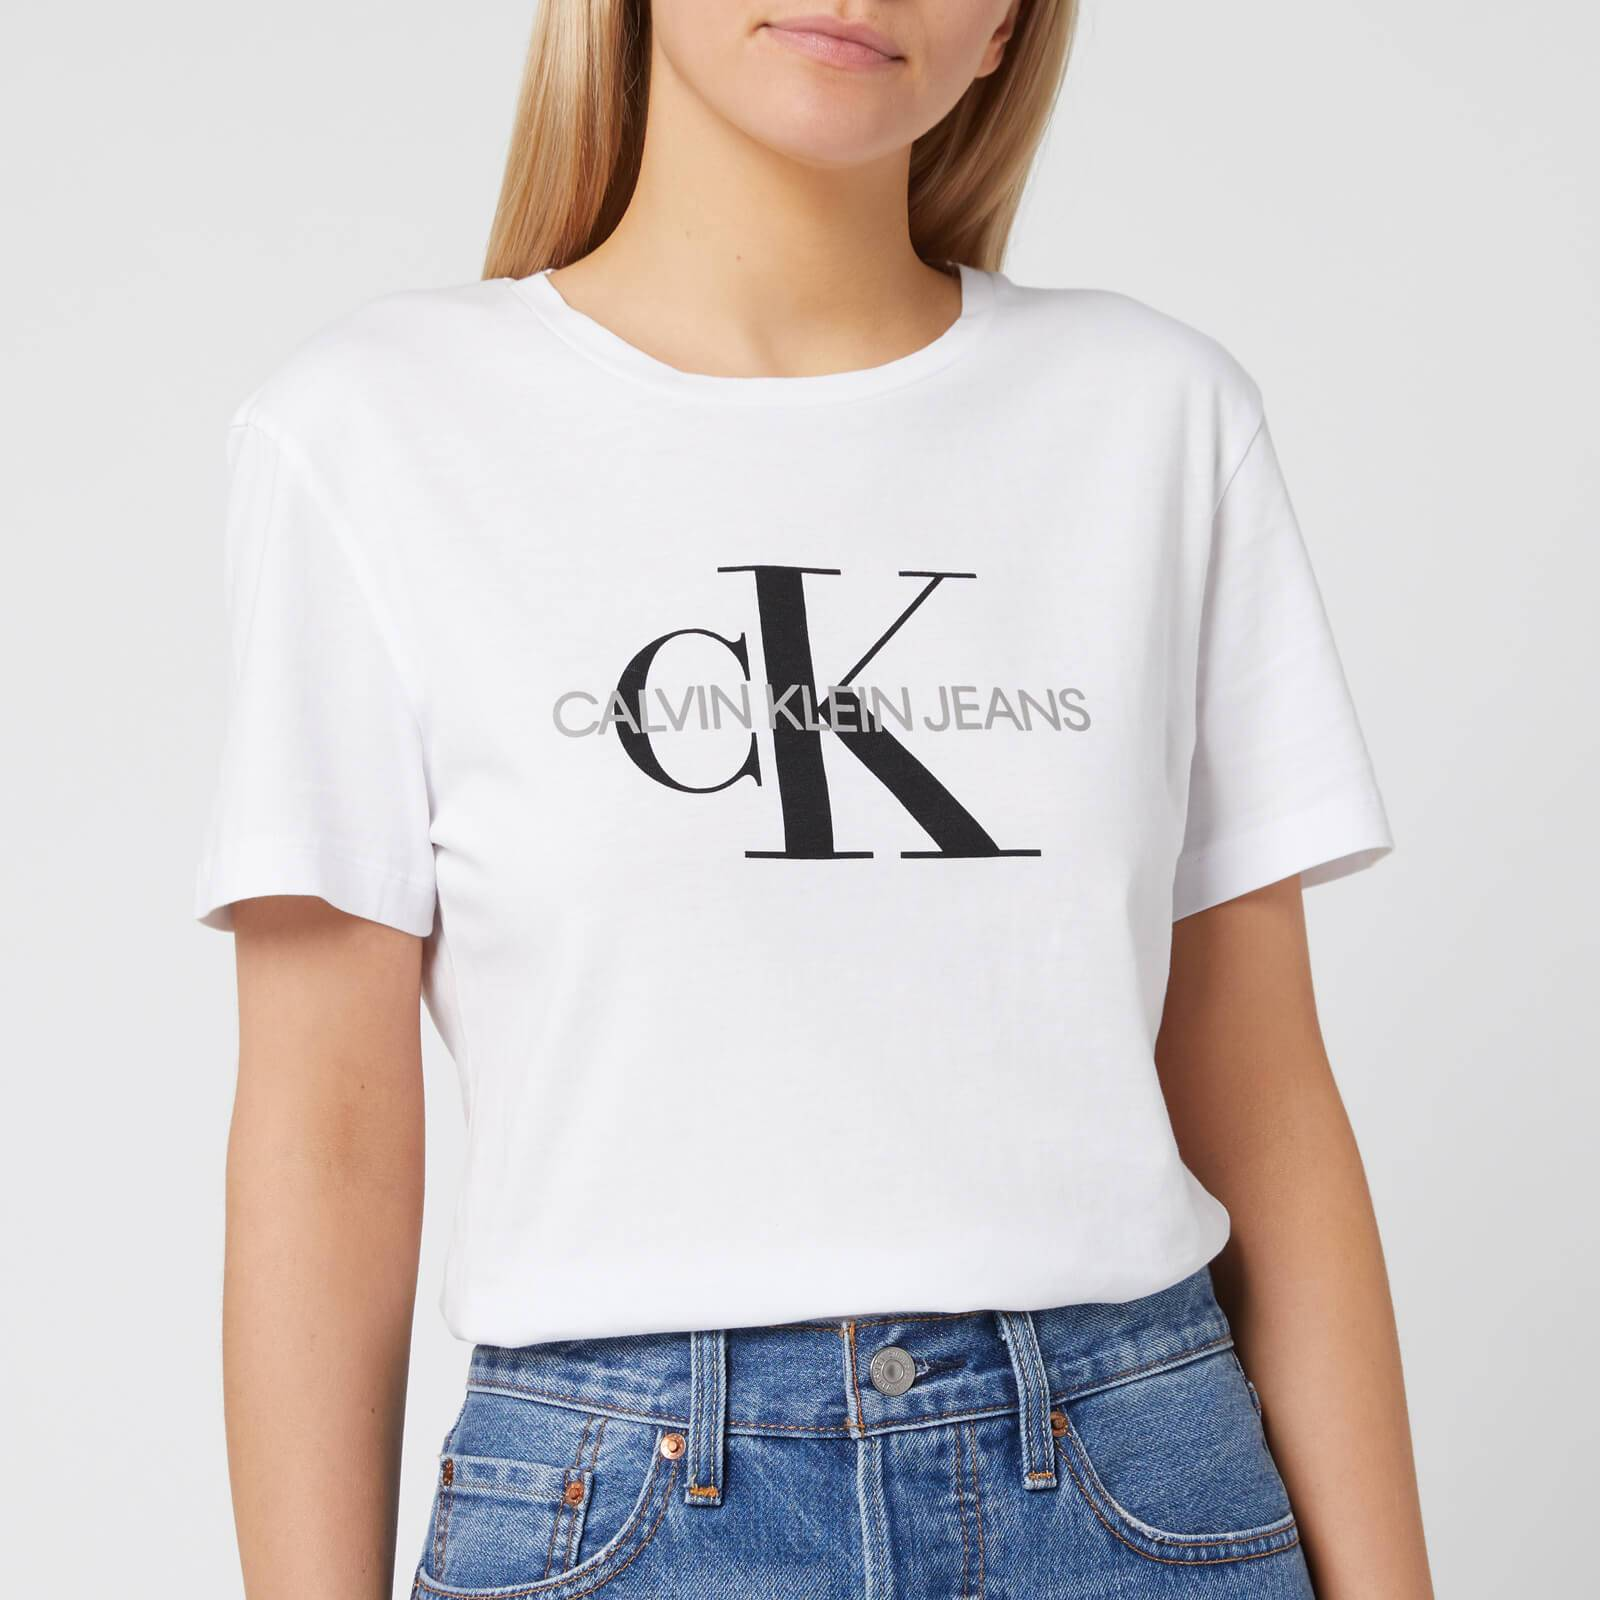 Calvin Klein Jeans Women's Monogram Logo Regular Fit T-Shirt - Bright White - XS